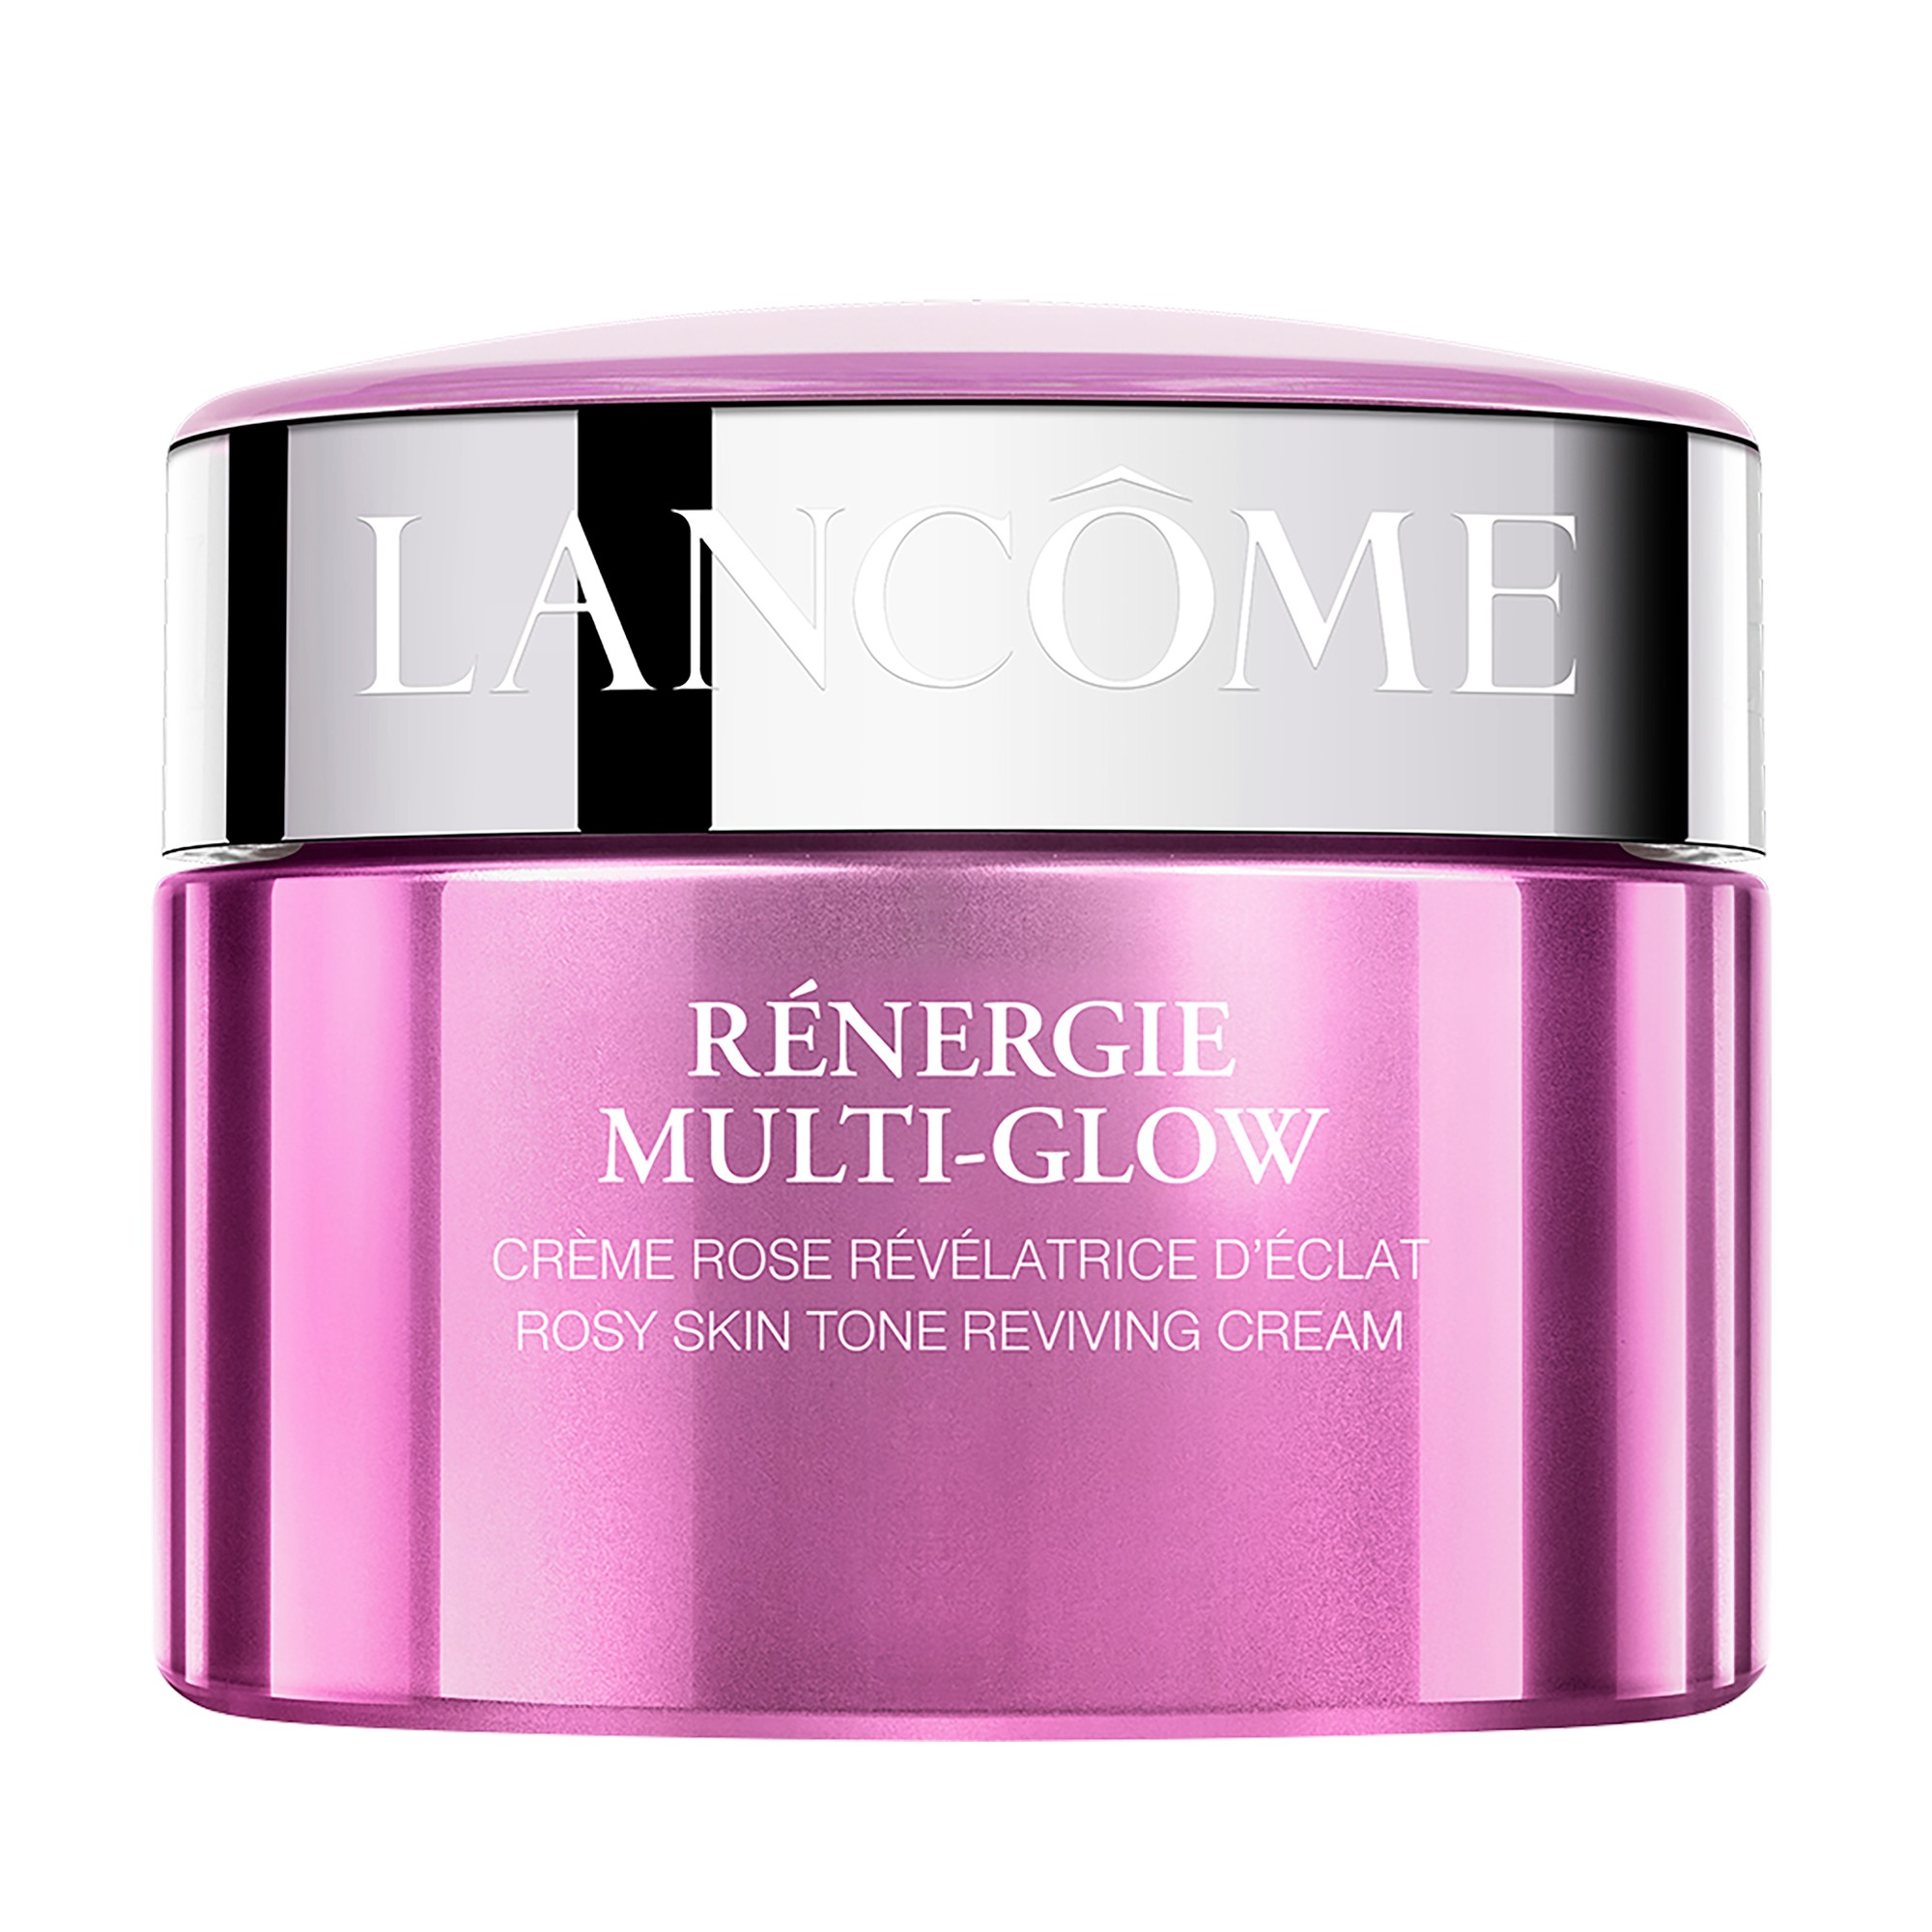 Renergie Multi Glow Day Cream 50ml